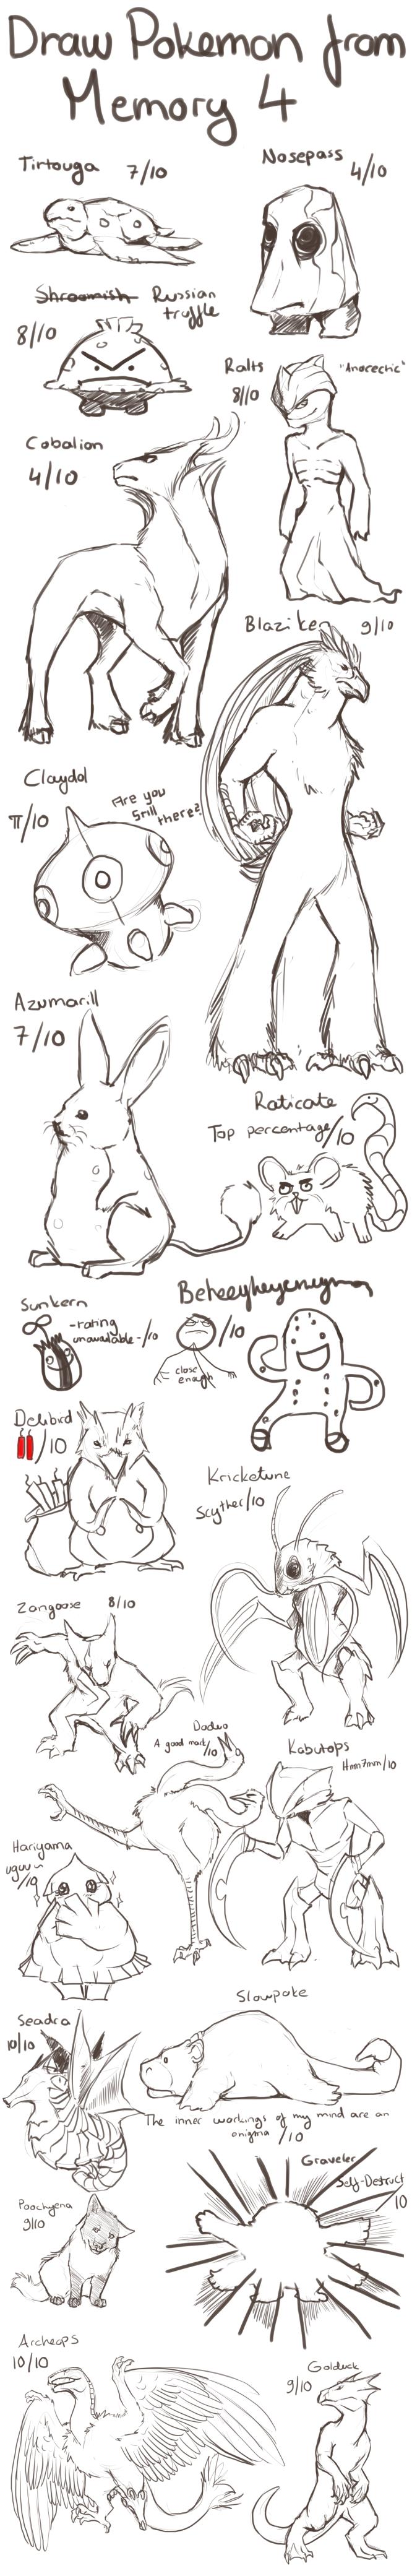 Draw Pokemon From Memory 4 by ShadeofShinon